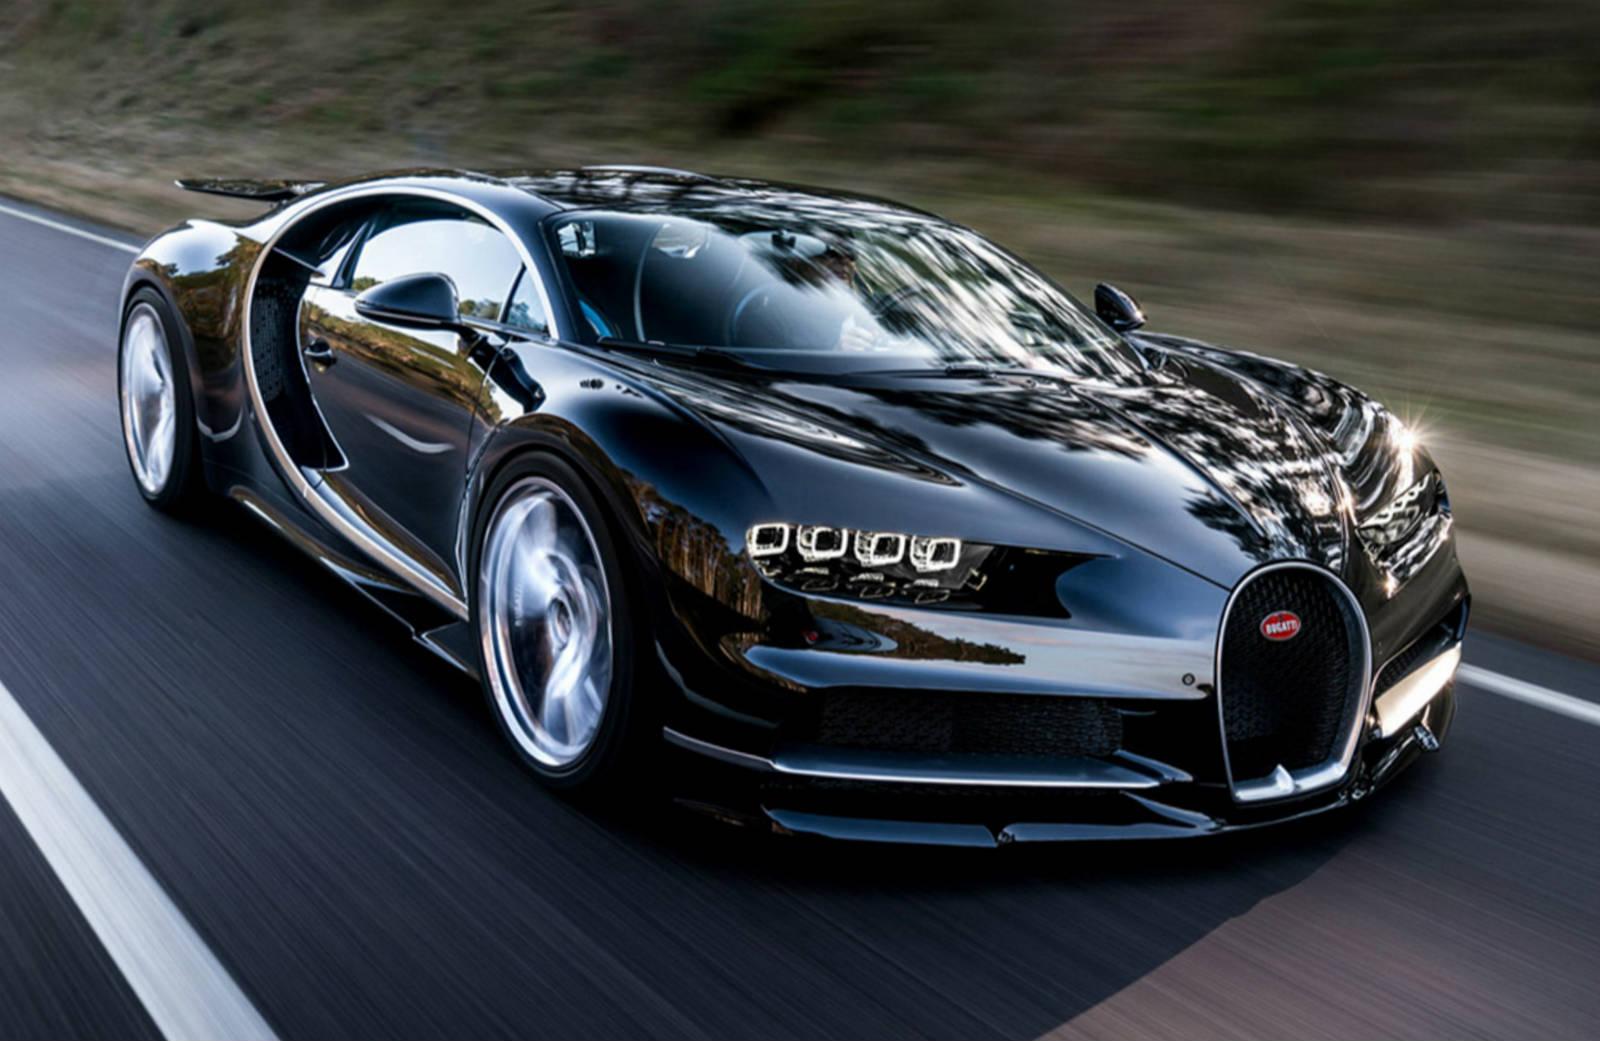 A Bugatti Chiron